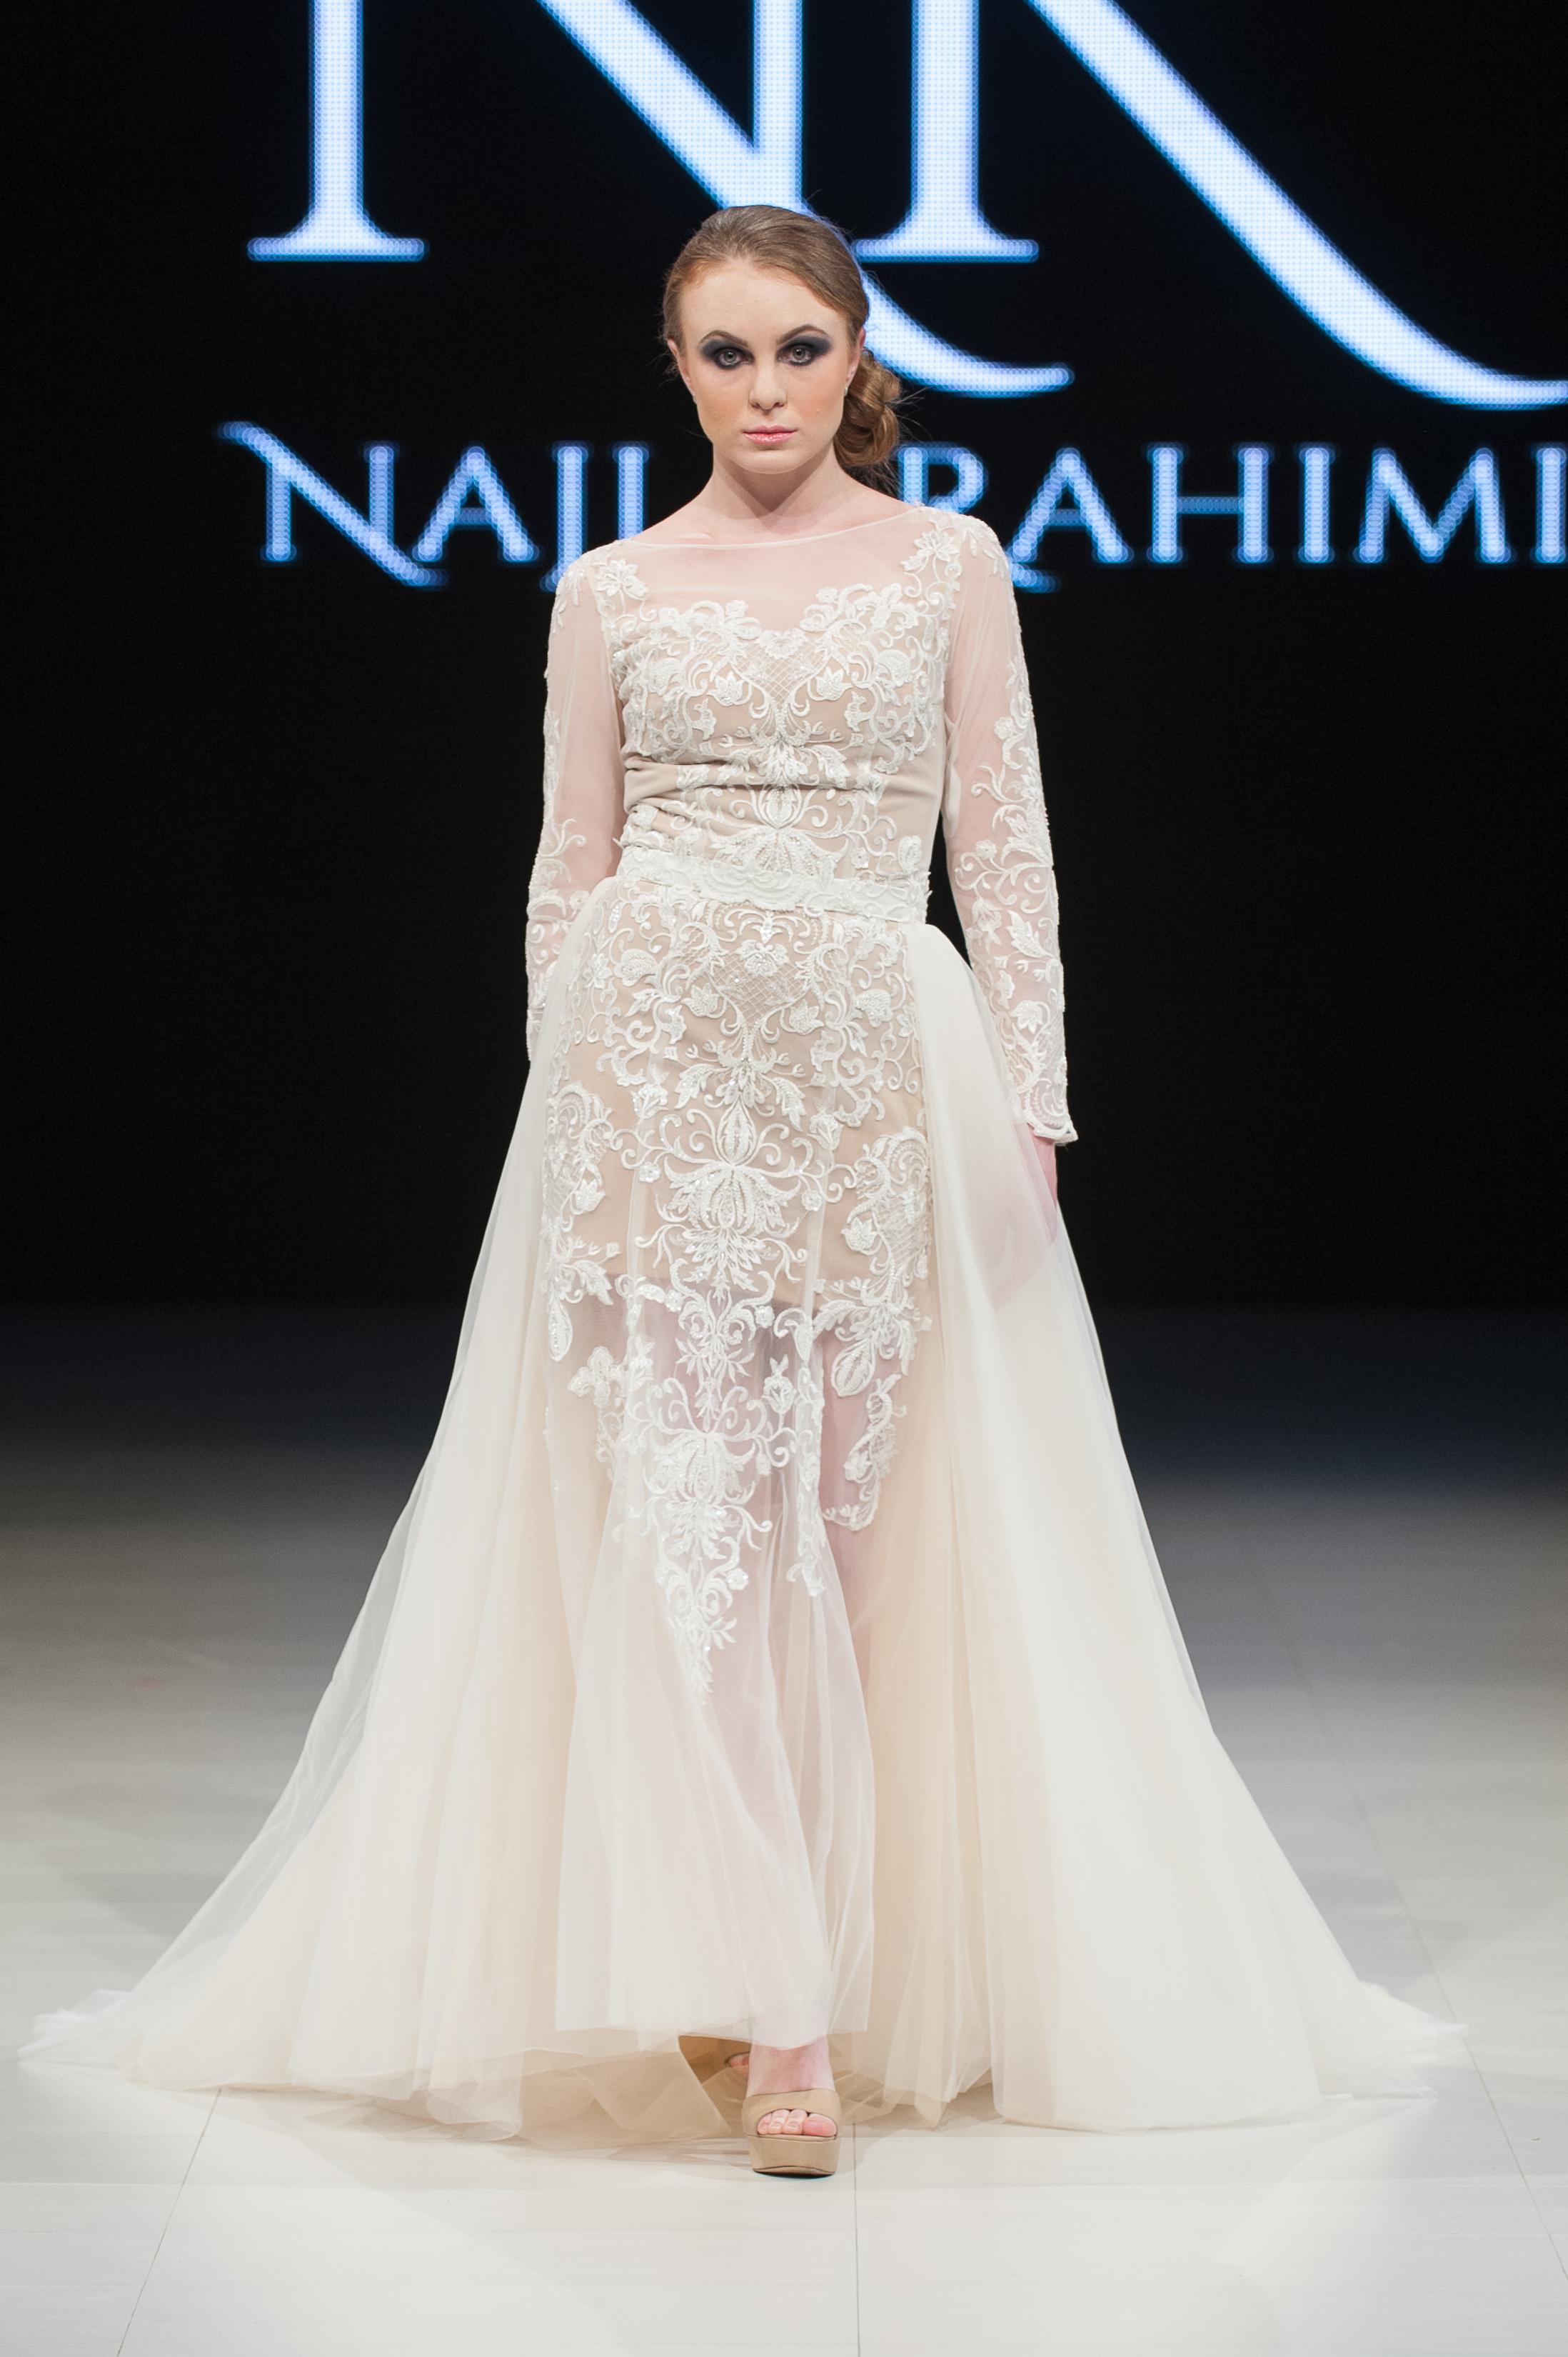 FAT2018-Day1-April17-Najla_Rahimi-Runway-Che_Rosales-LARAWAN-5735.jpg